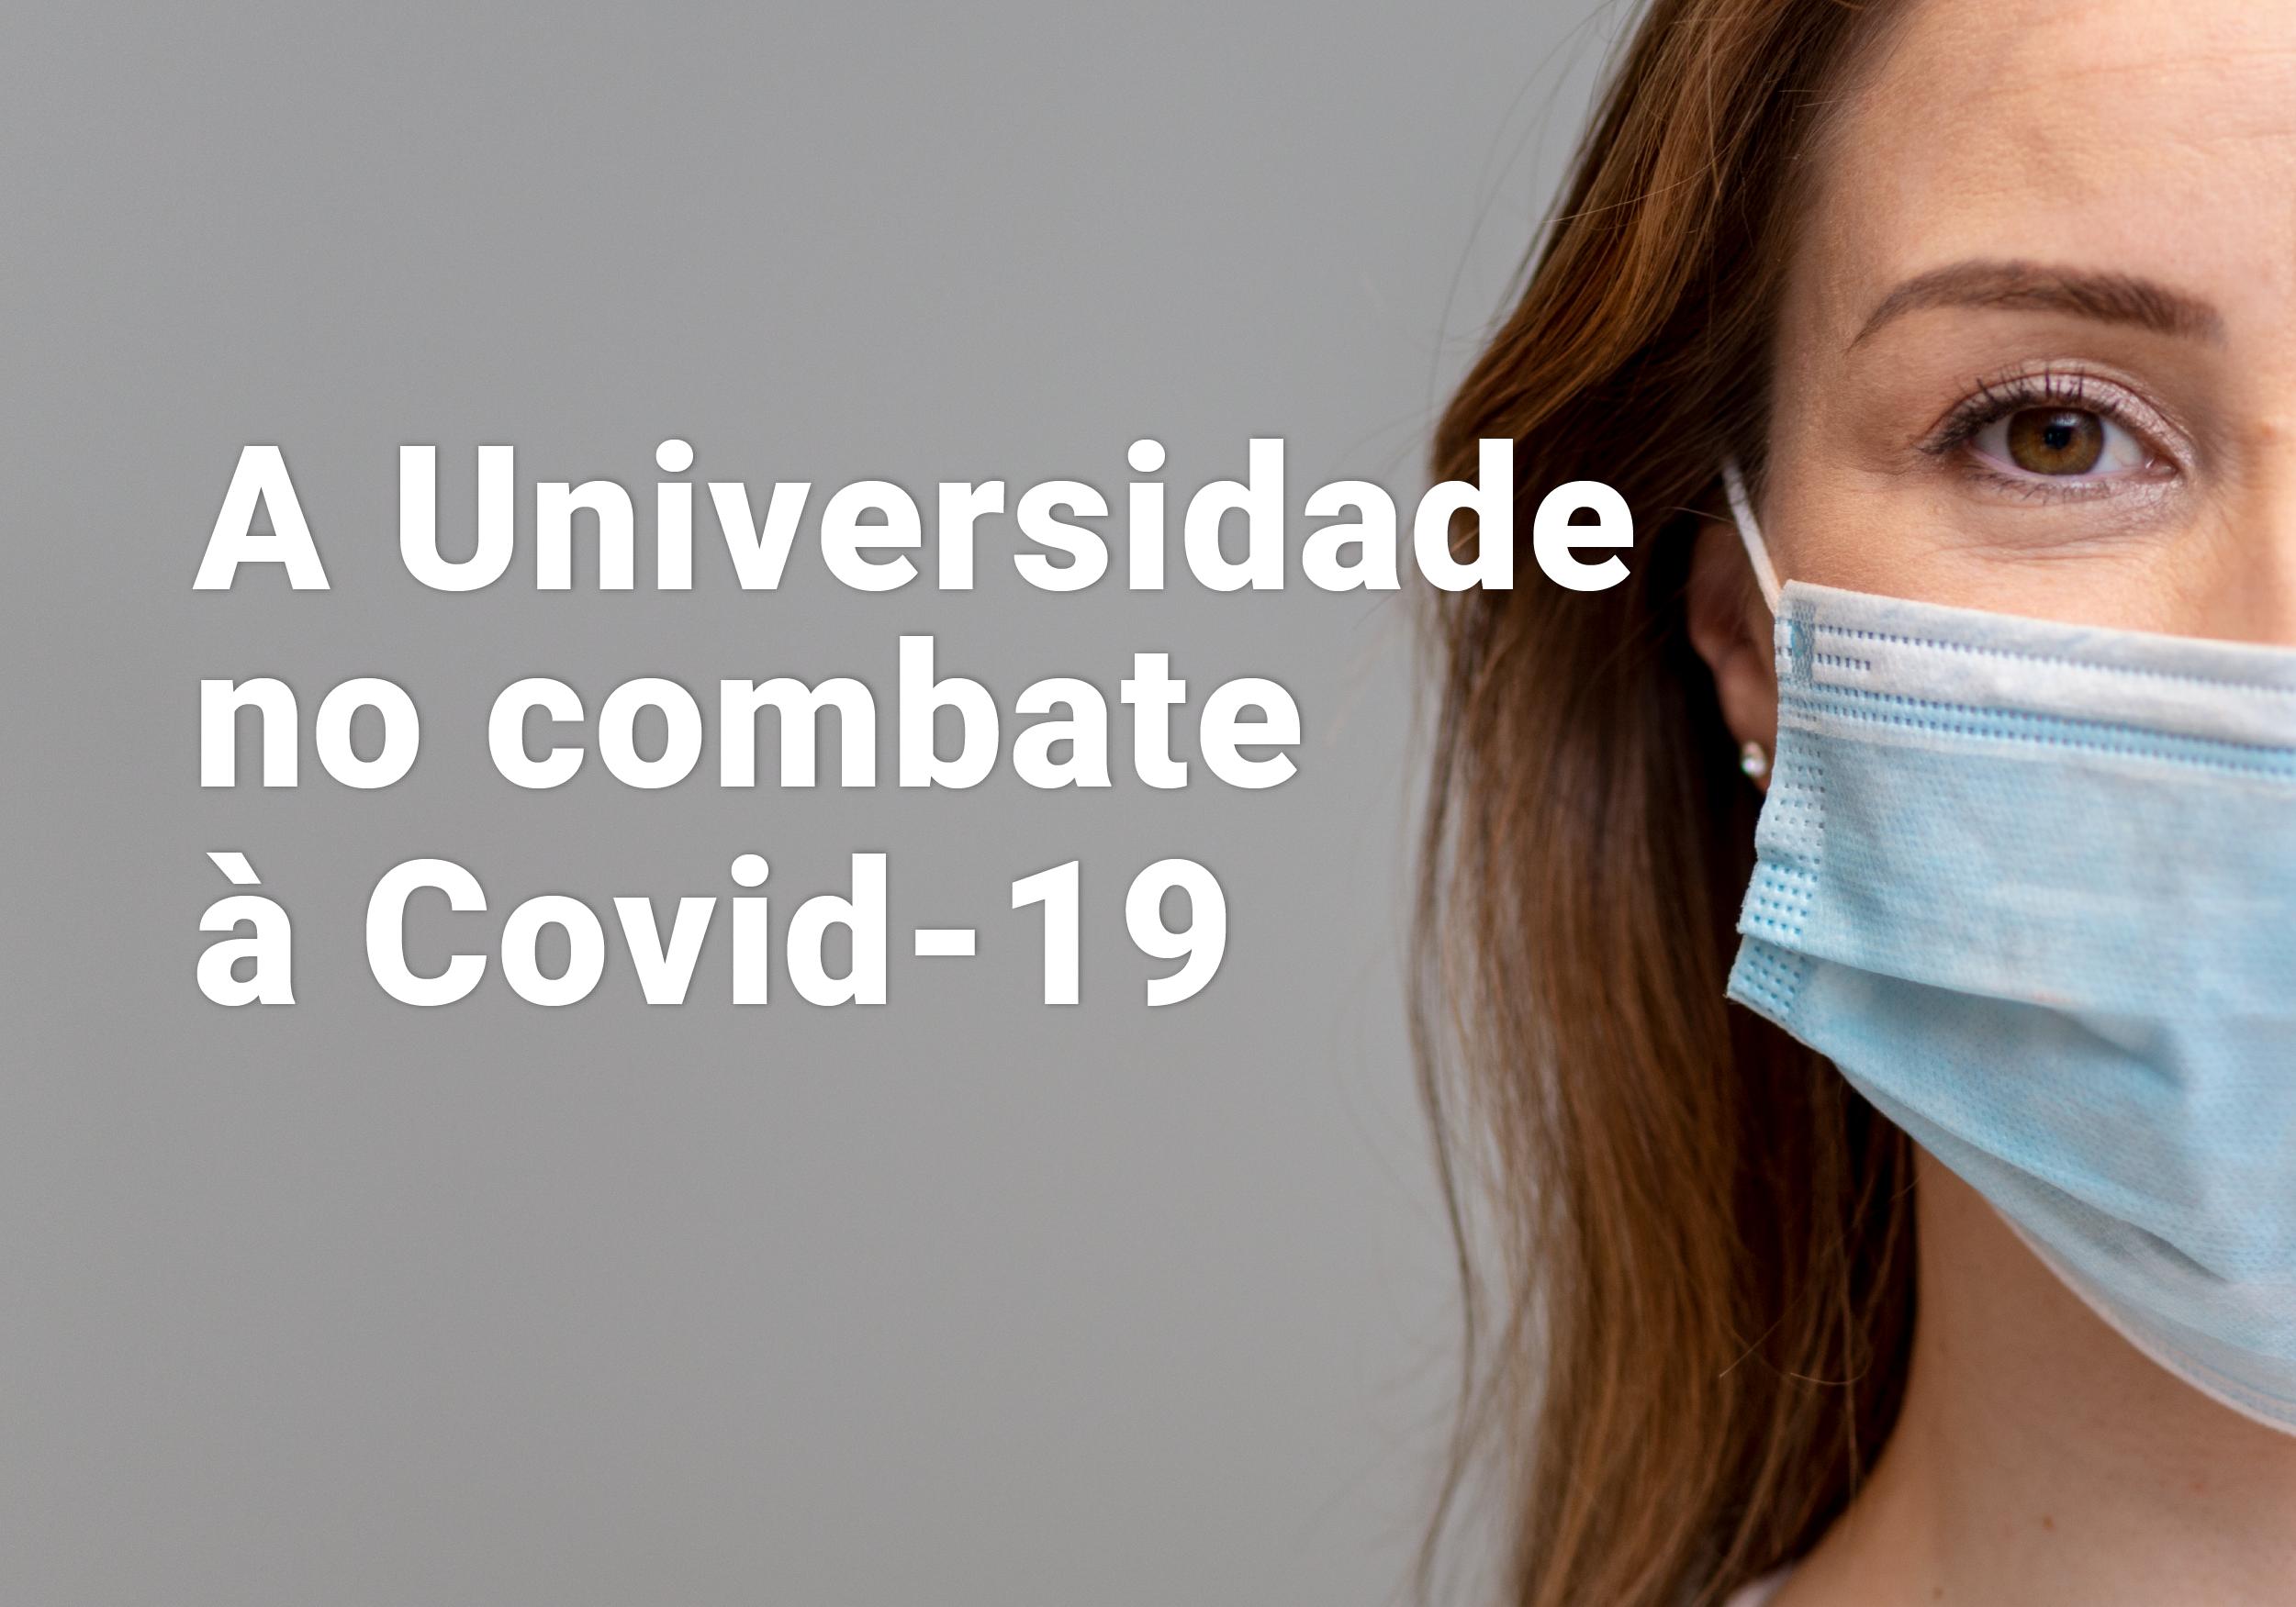 A Universidade no combate a Covid-19